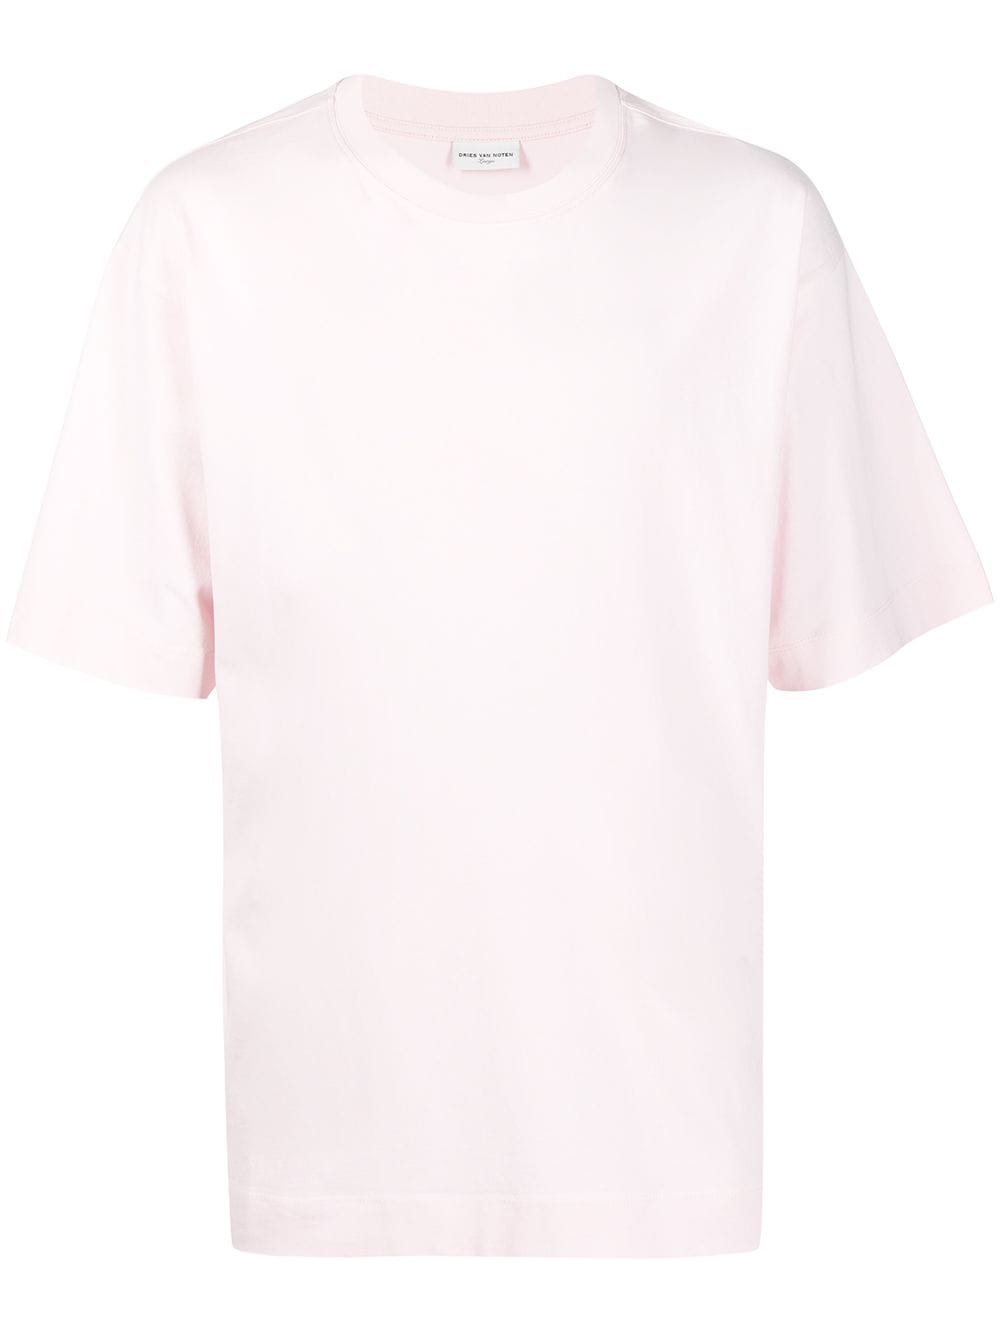 OVERSIZE T-SHIRT DRIES VAN NOTEN | T-shirts | HELI2603PINK